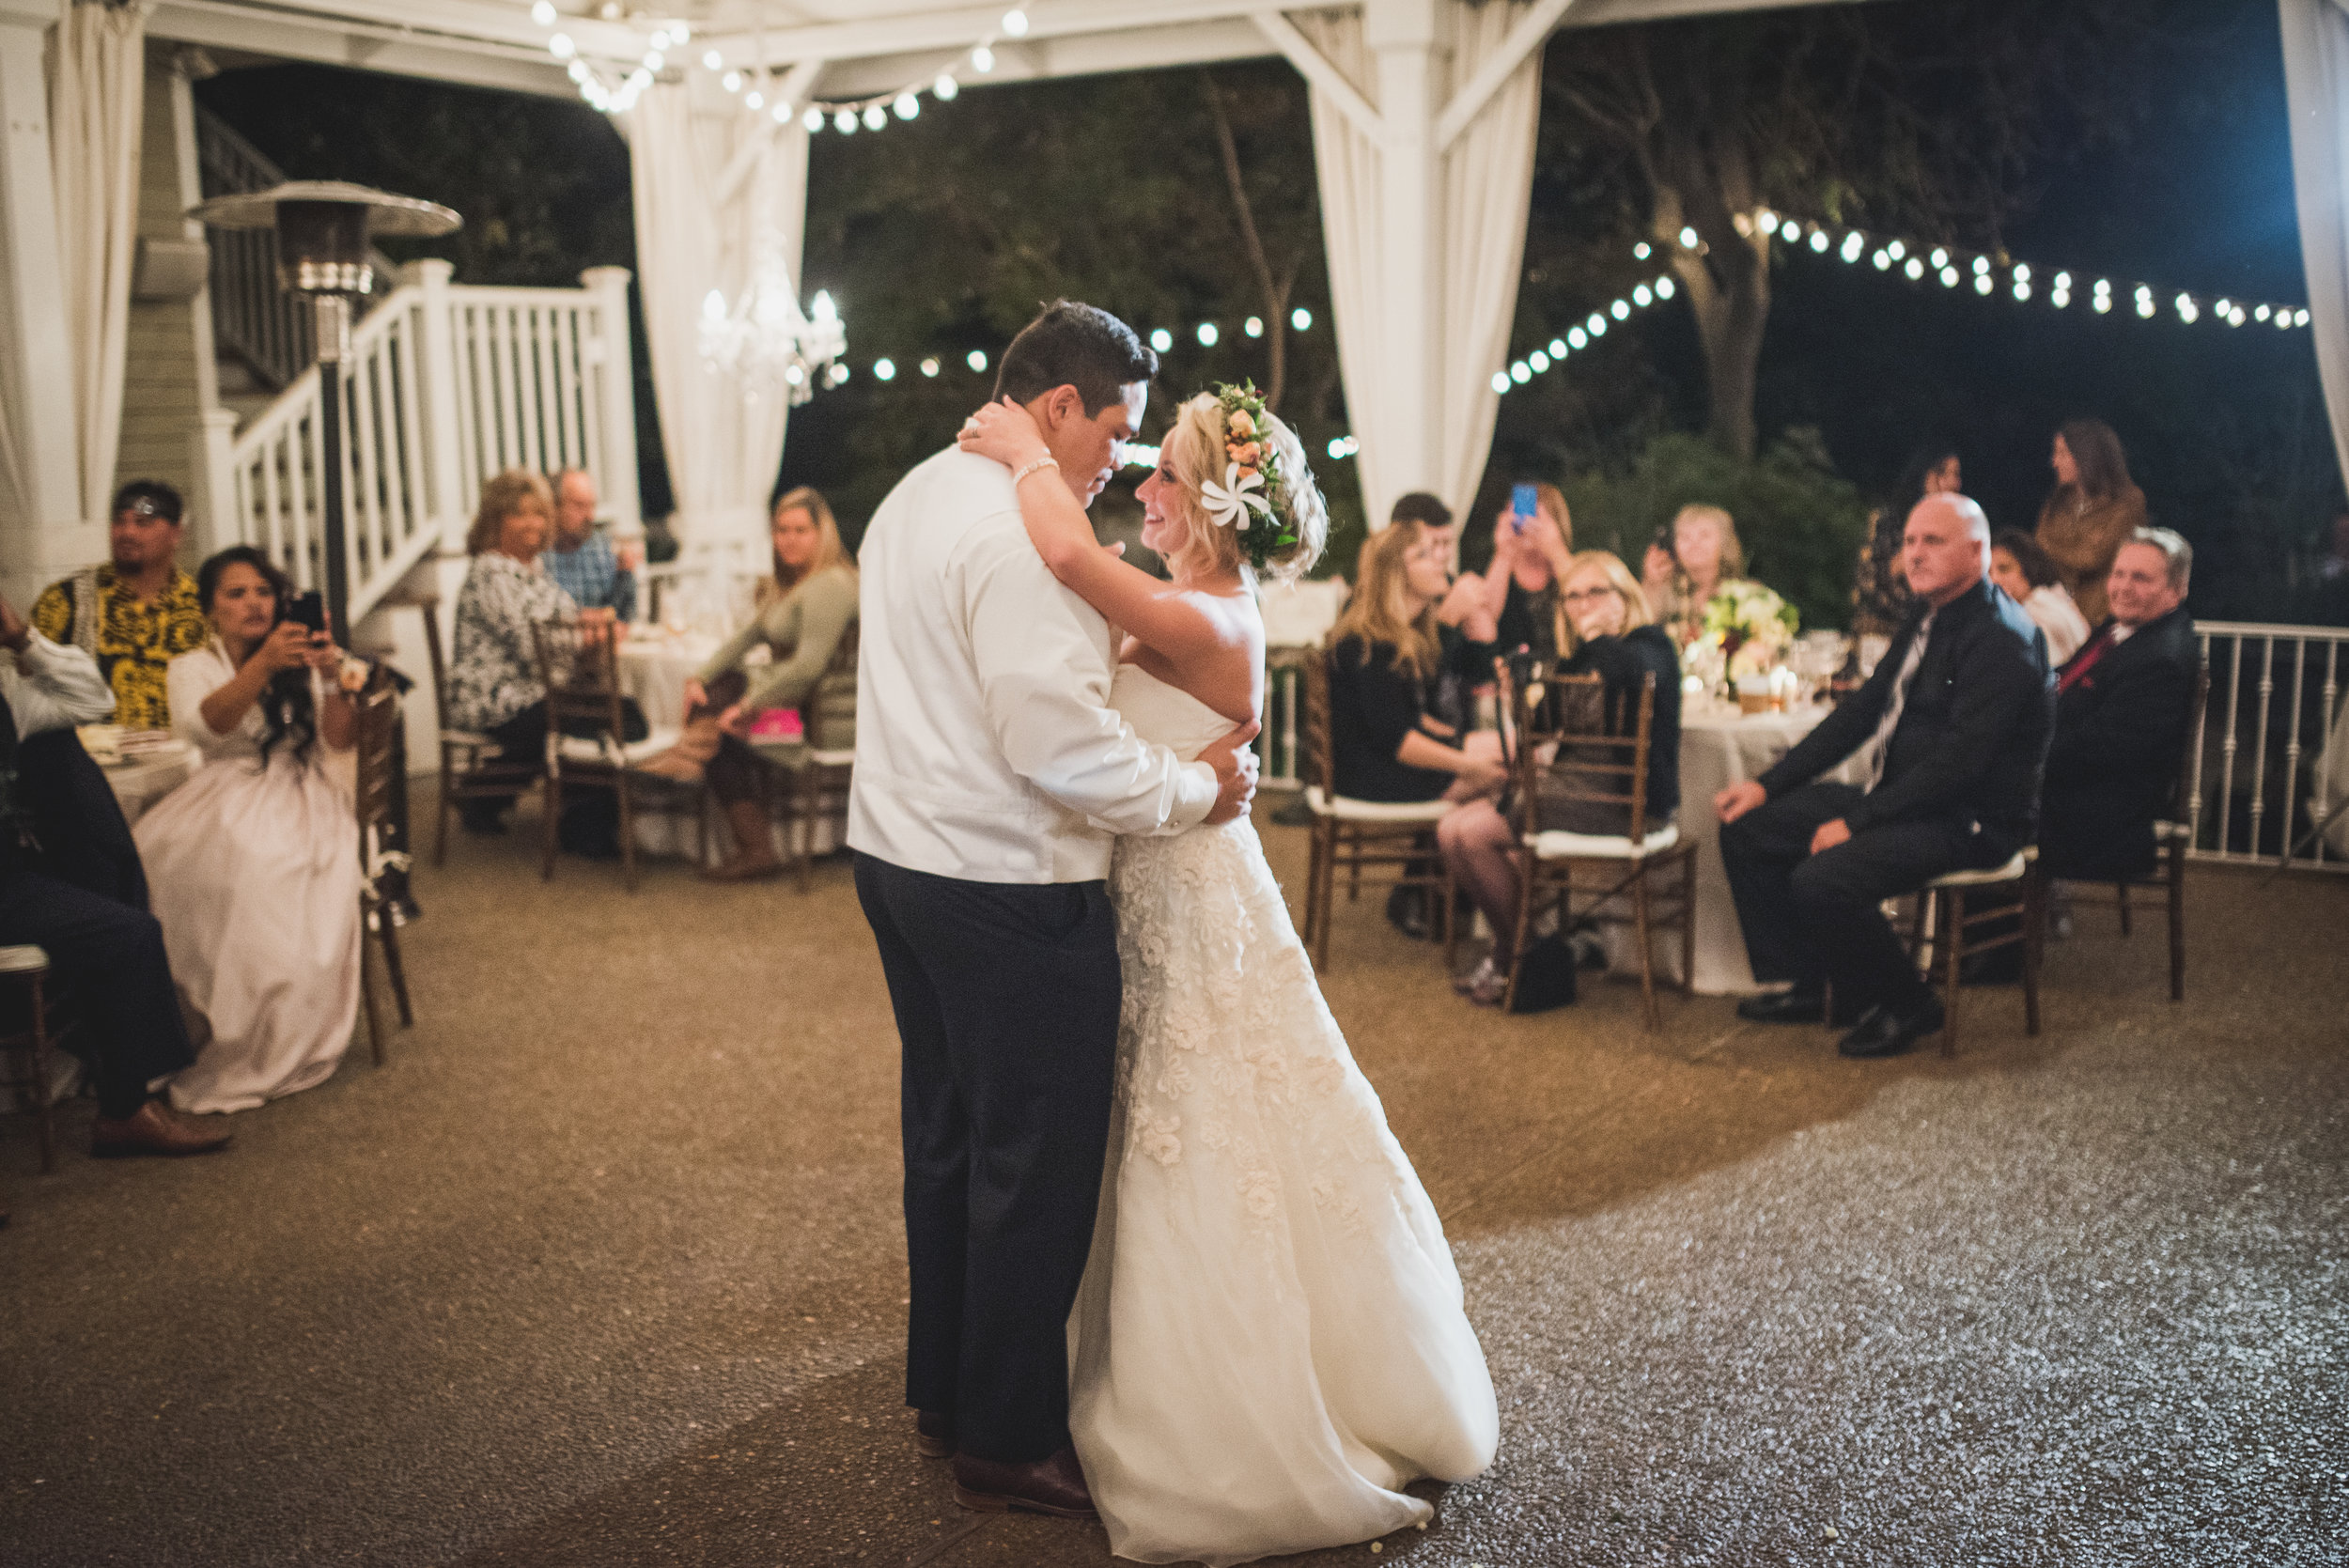 Nashville-wedding-photographers-CJ's-Off-The-Square-57.JPG